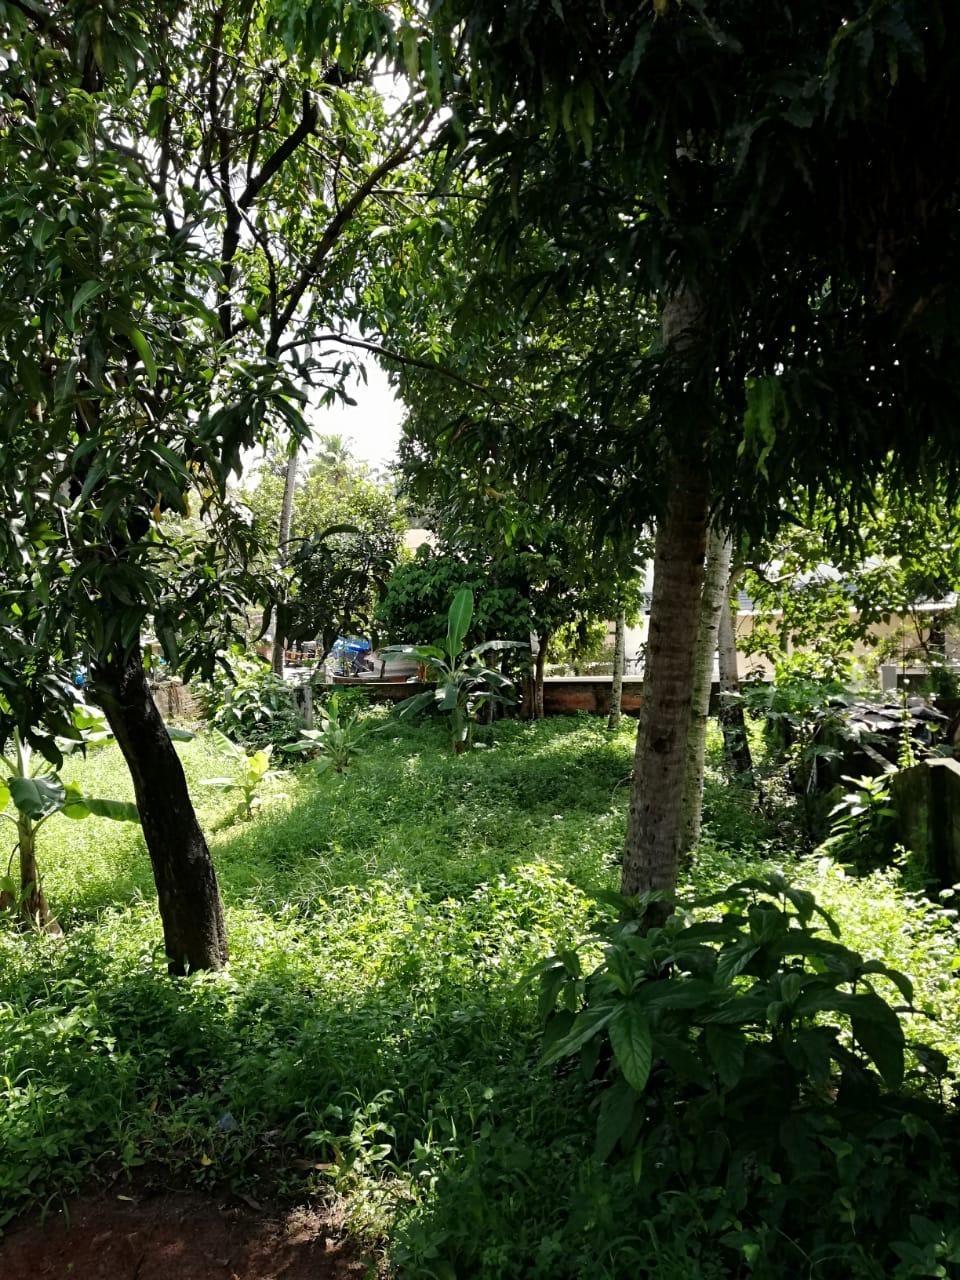 Vattiyoorkavu – Thittamangalam Junction. Prime Property